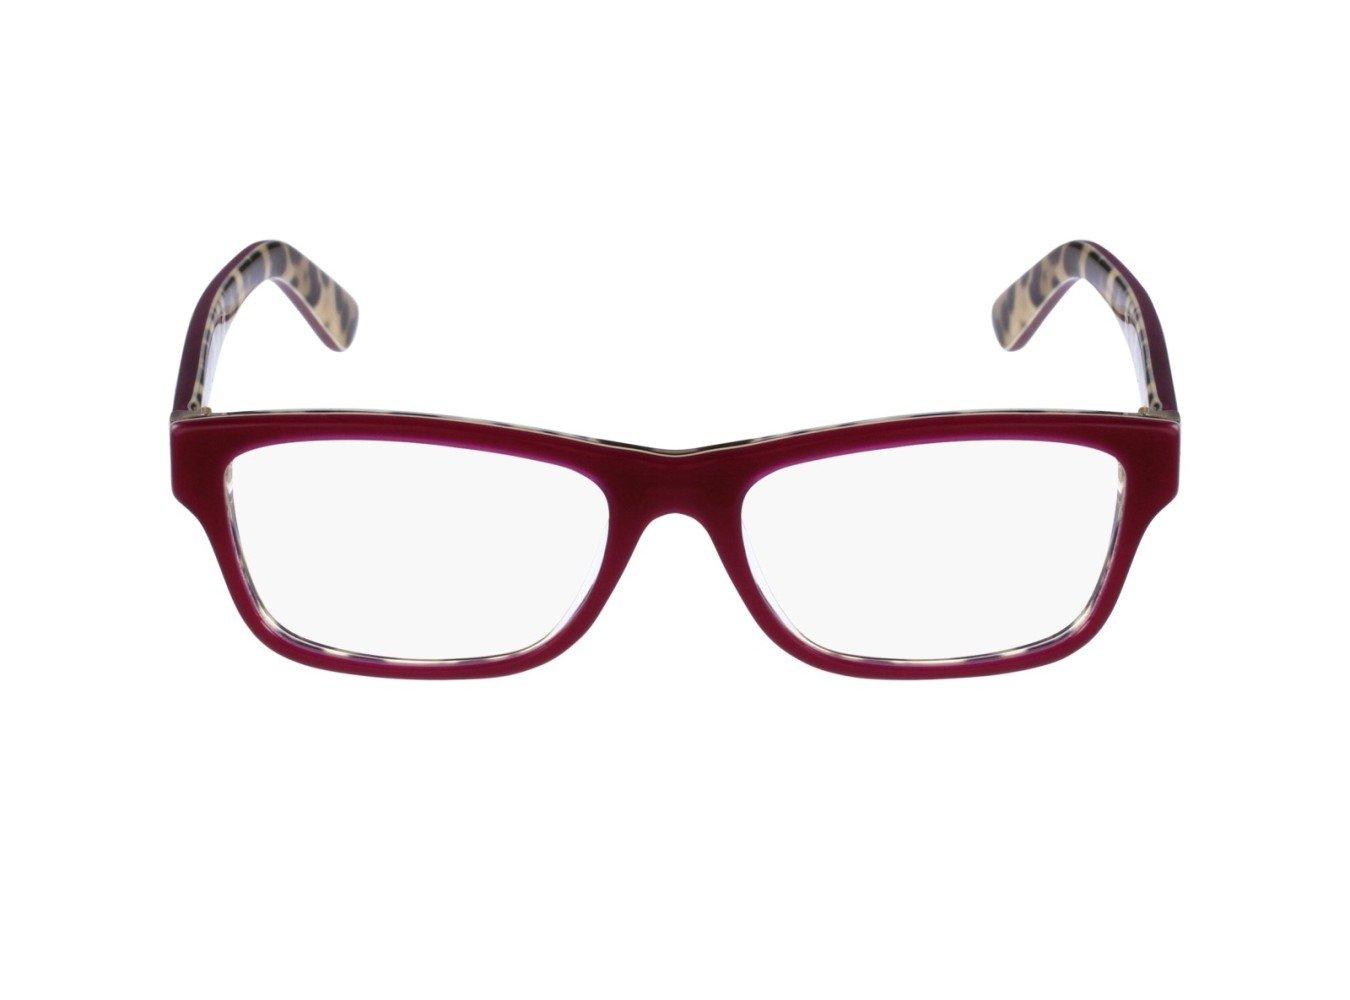 Dolce&Gabbana ENCHANTED BEAUTIES DG3208 Eyeglass Frames 2882-52 - Top Opal Bordeaux/Leo